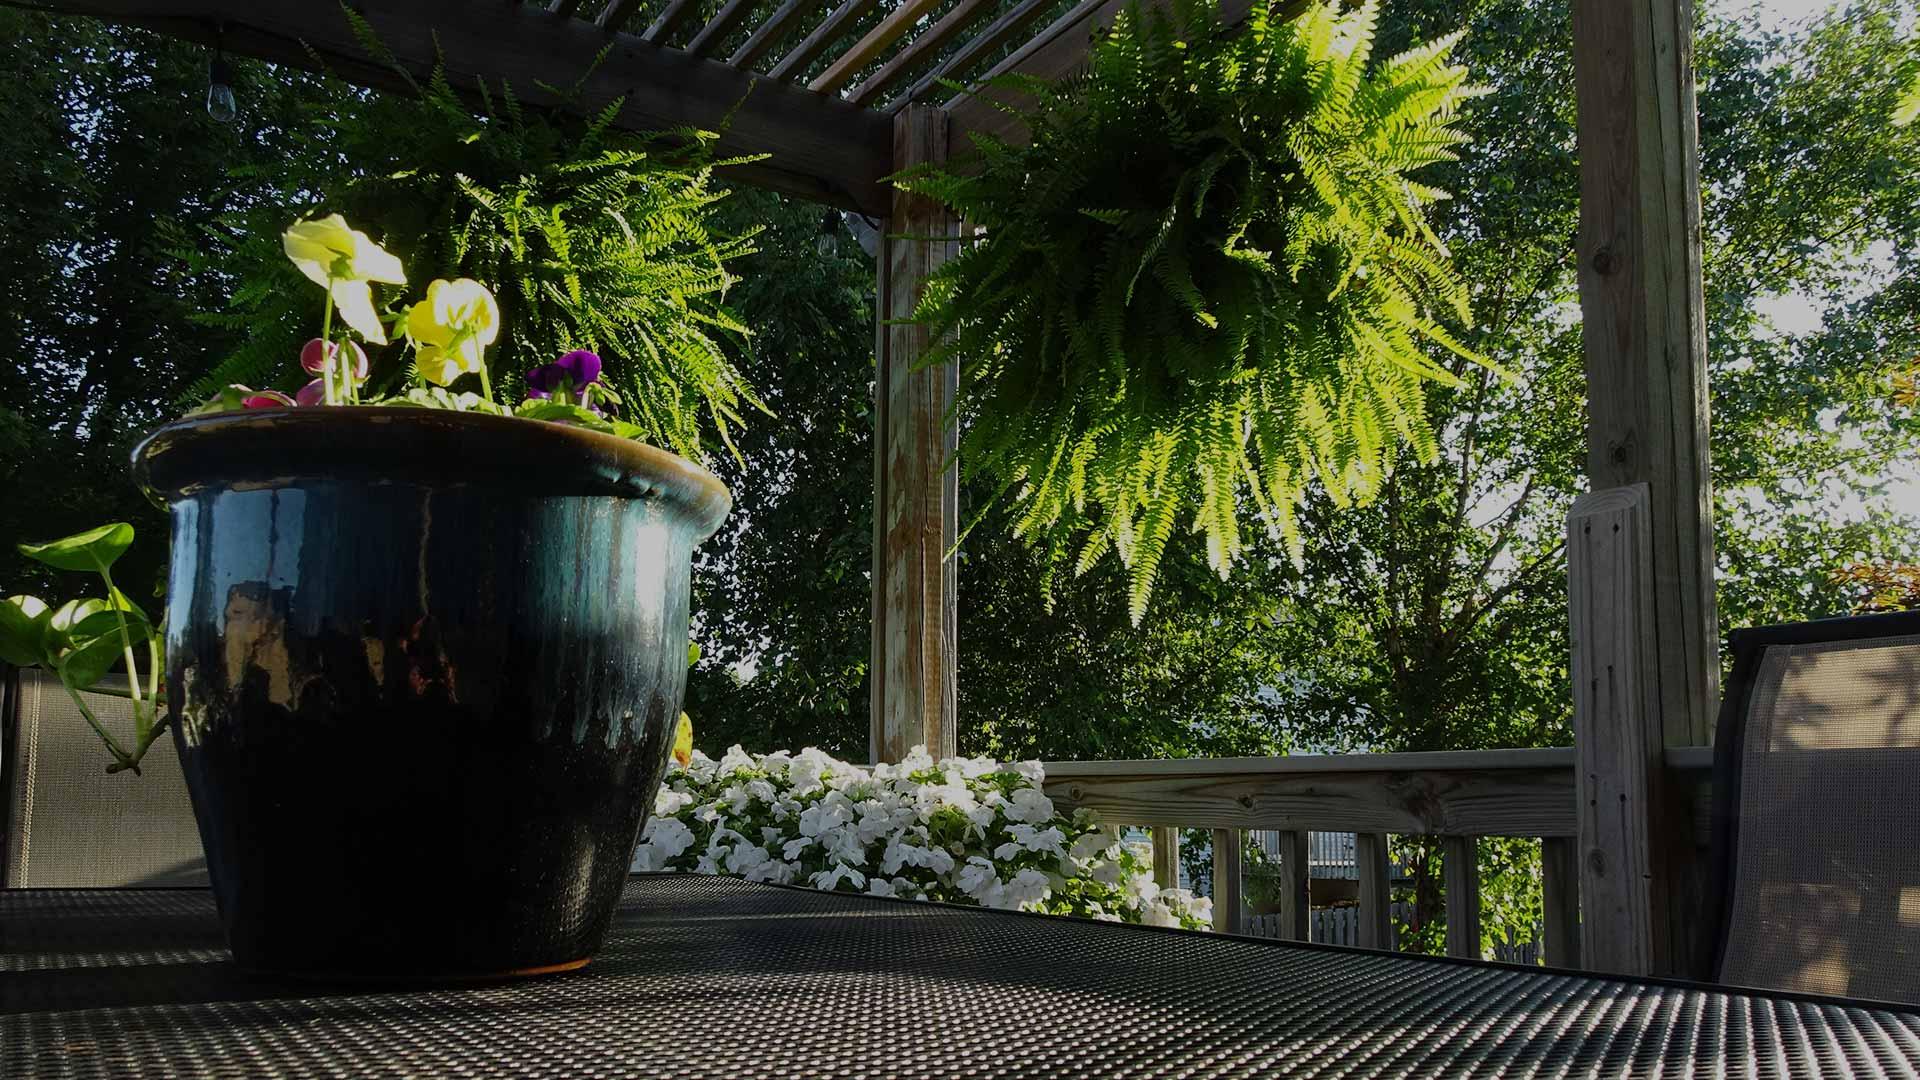 Nice deck plants